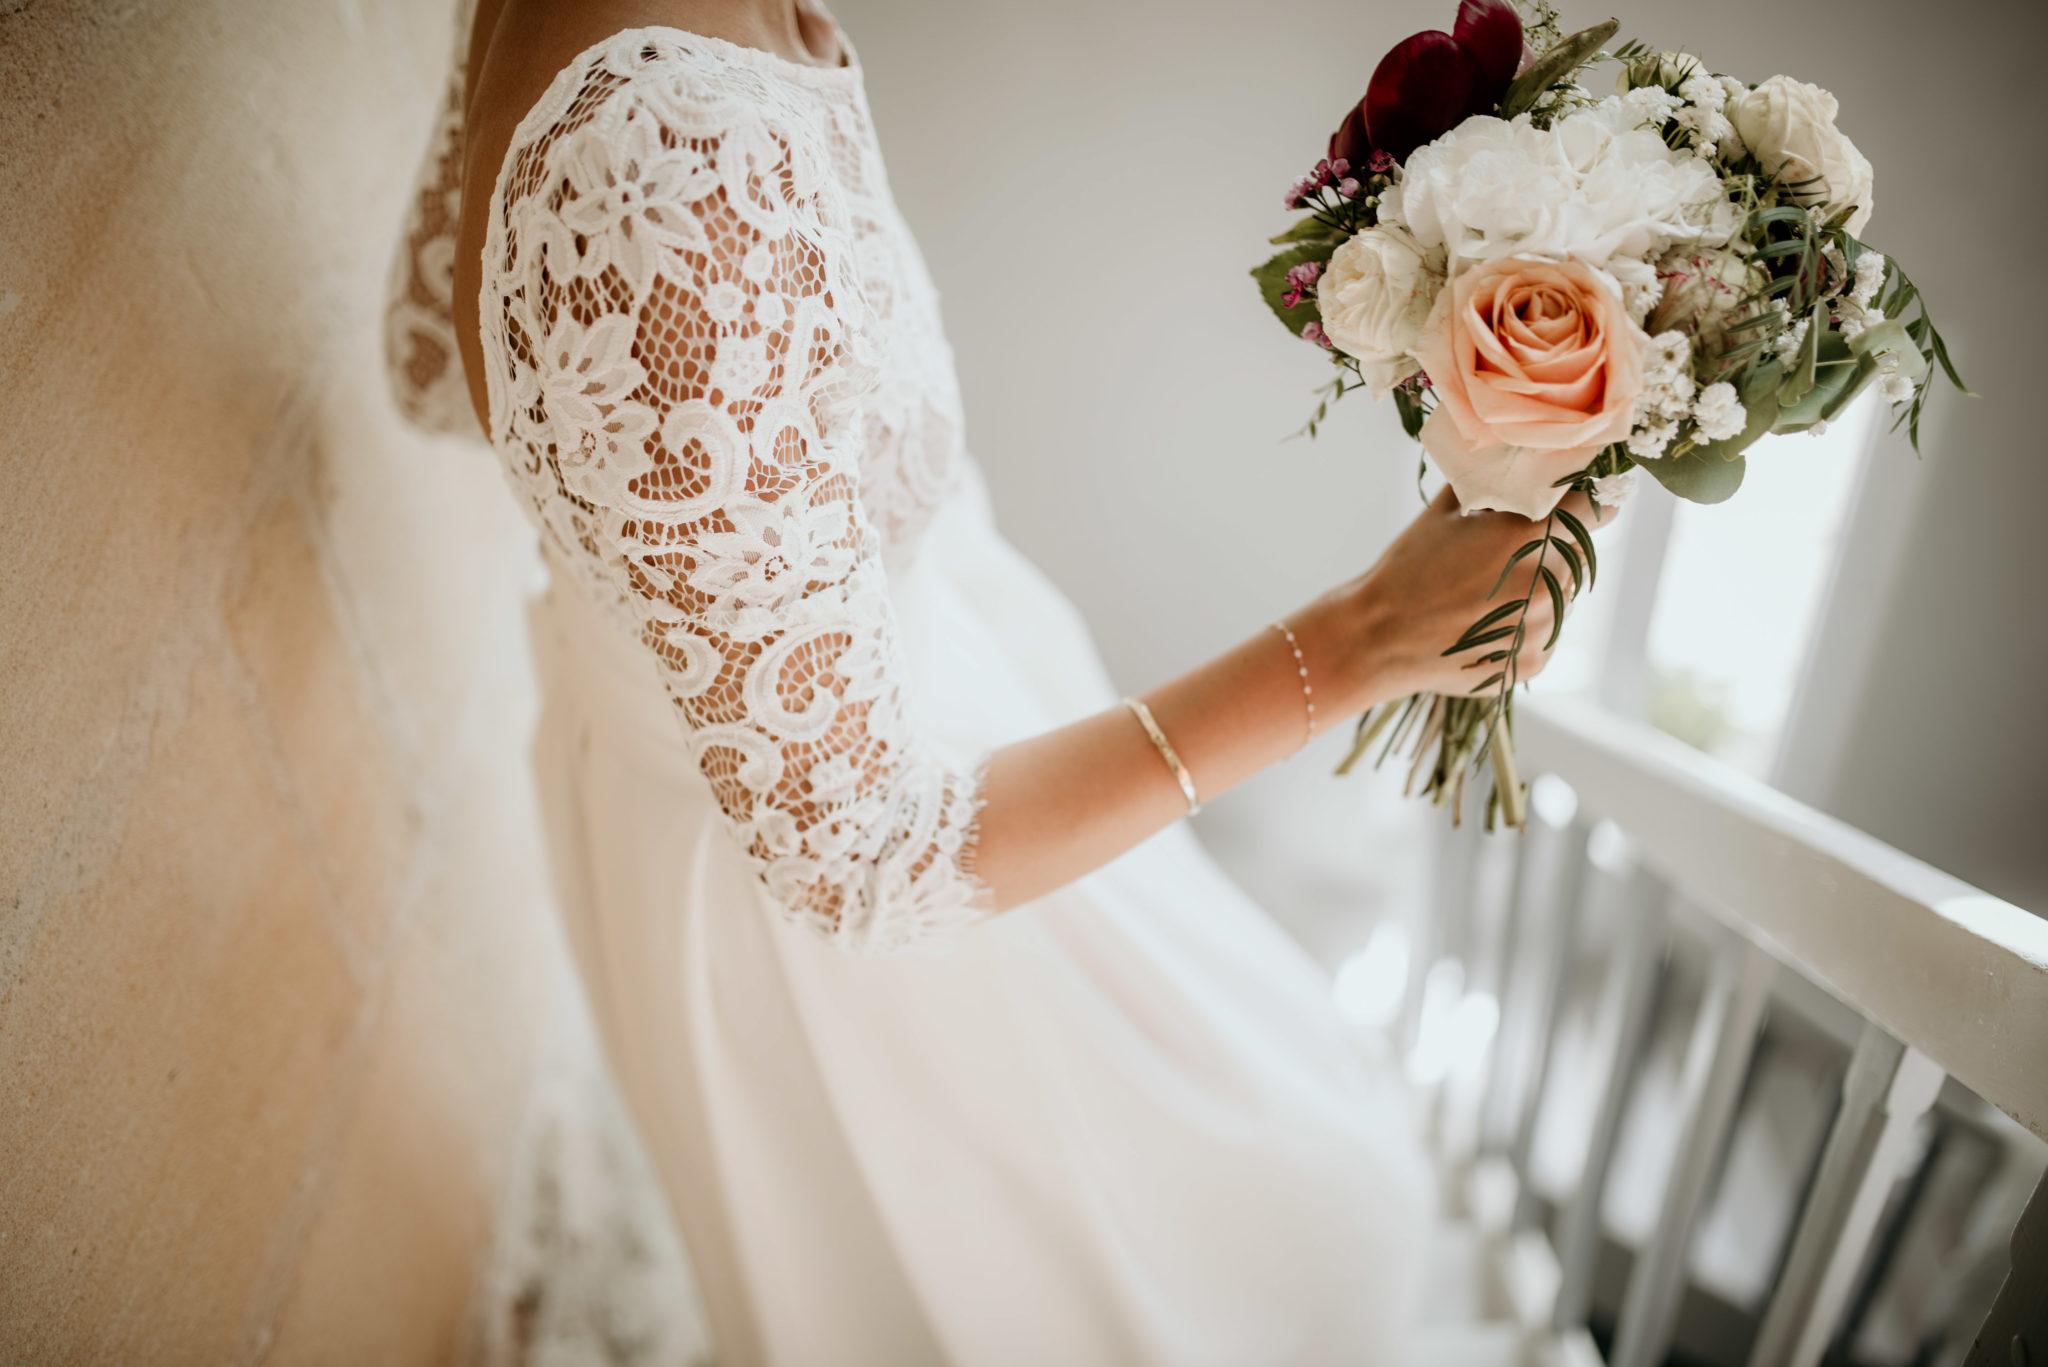 wedding-planner-jour-j-couple-mariage-mariee